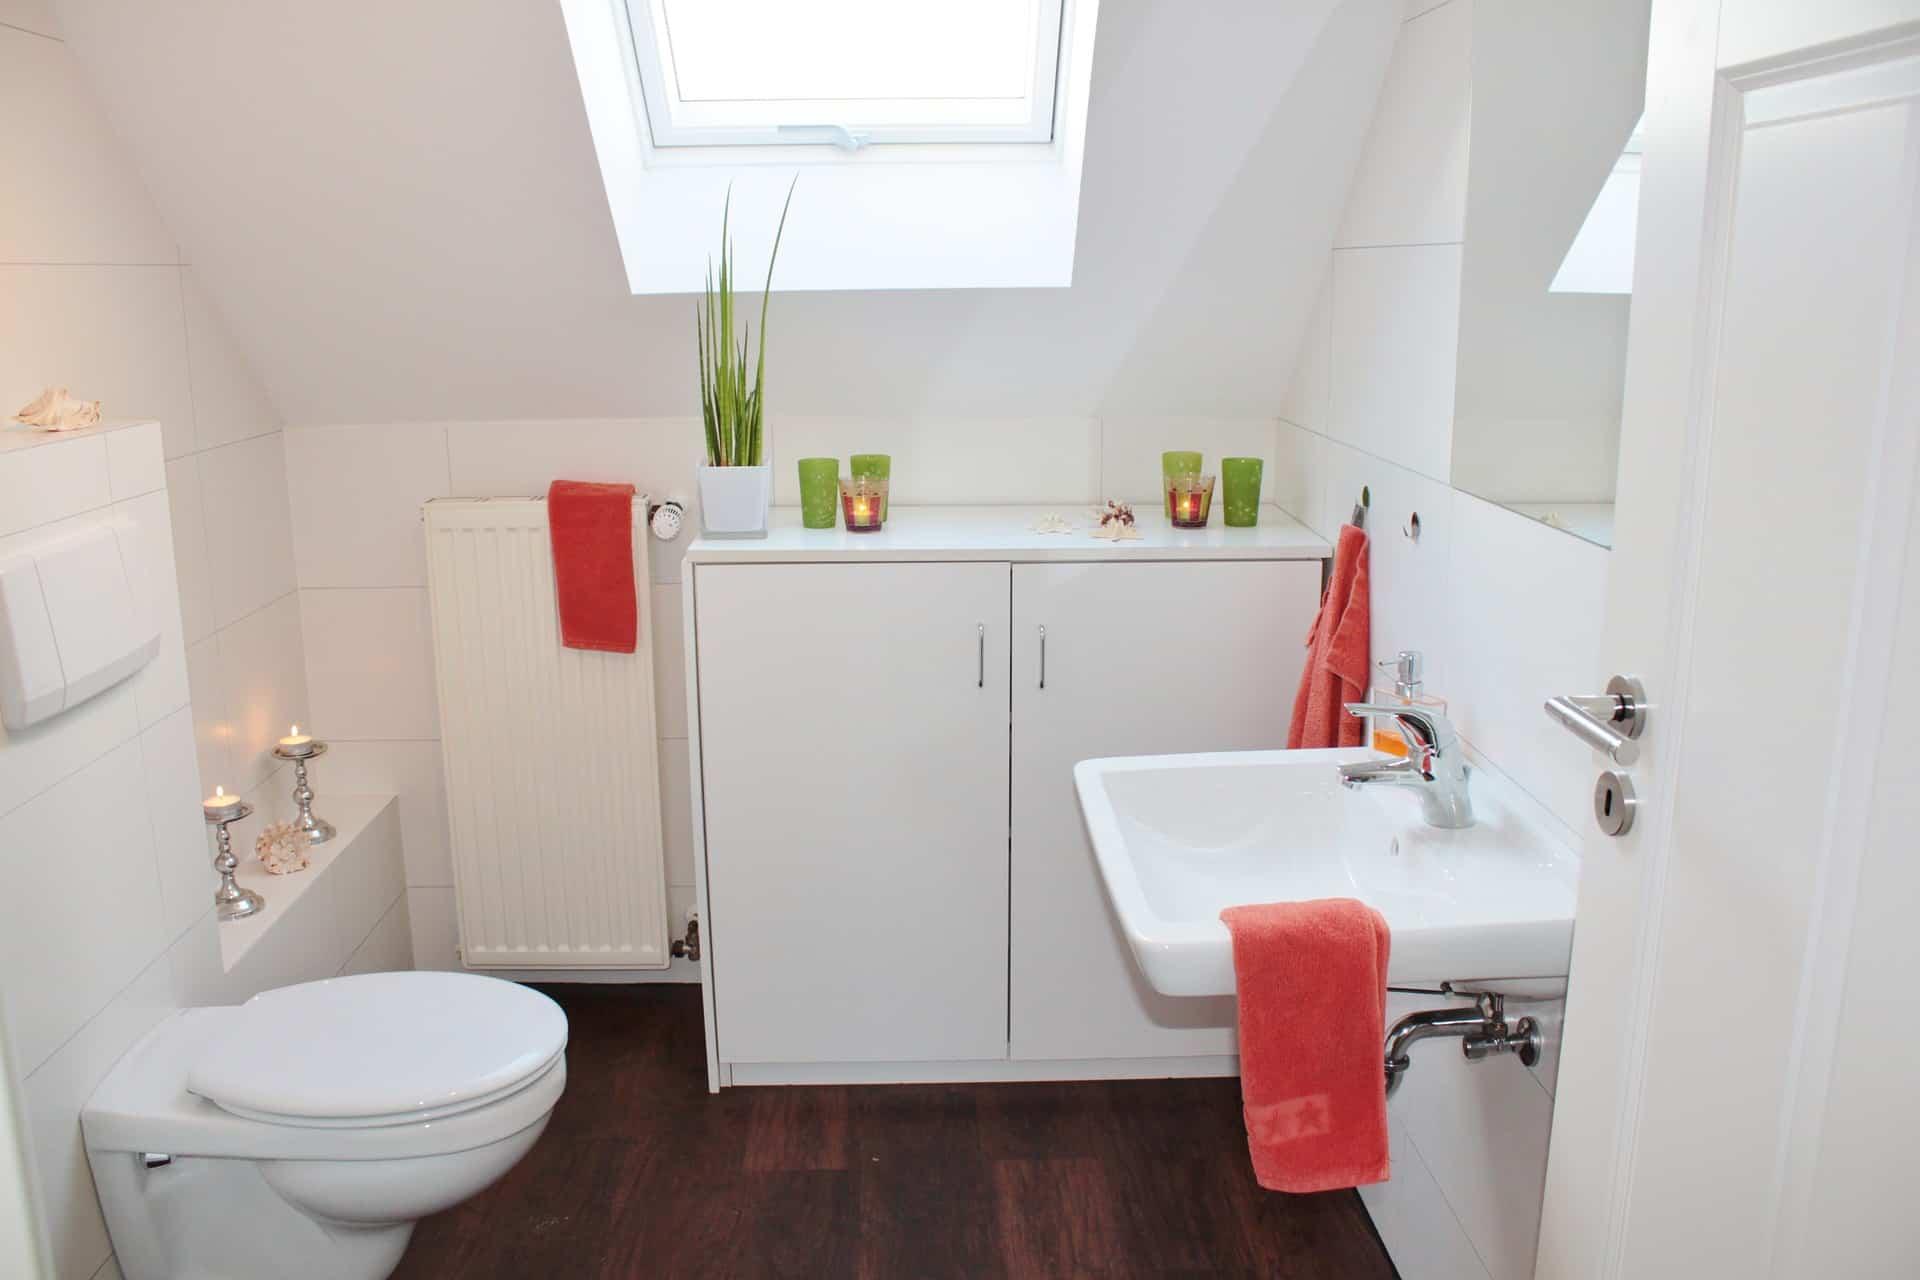 mueble del lavabo